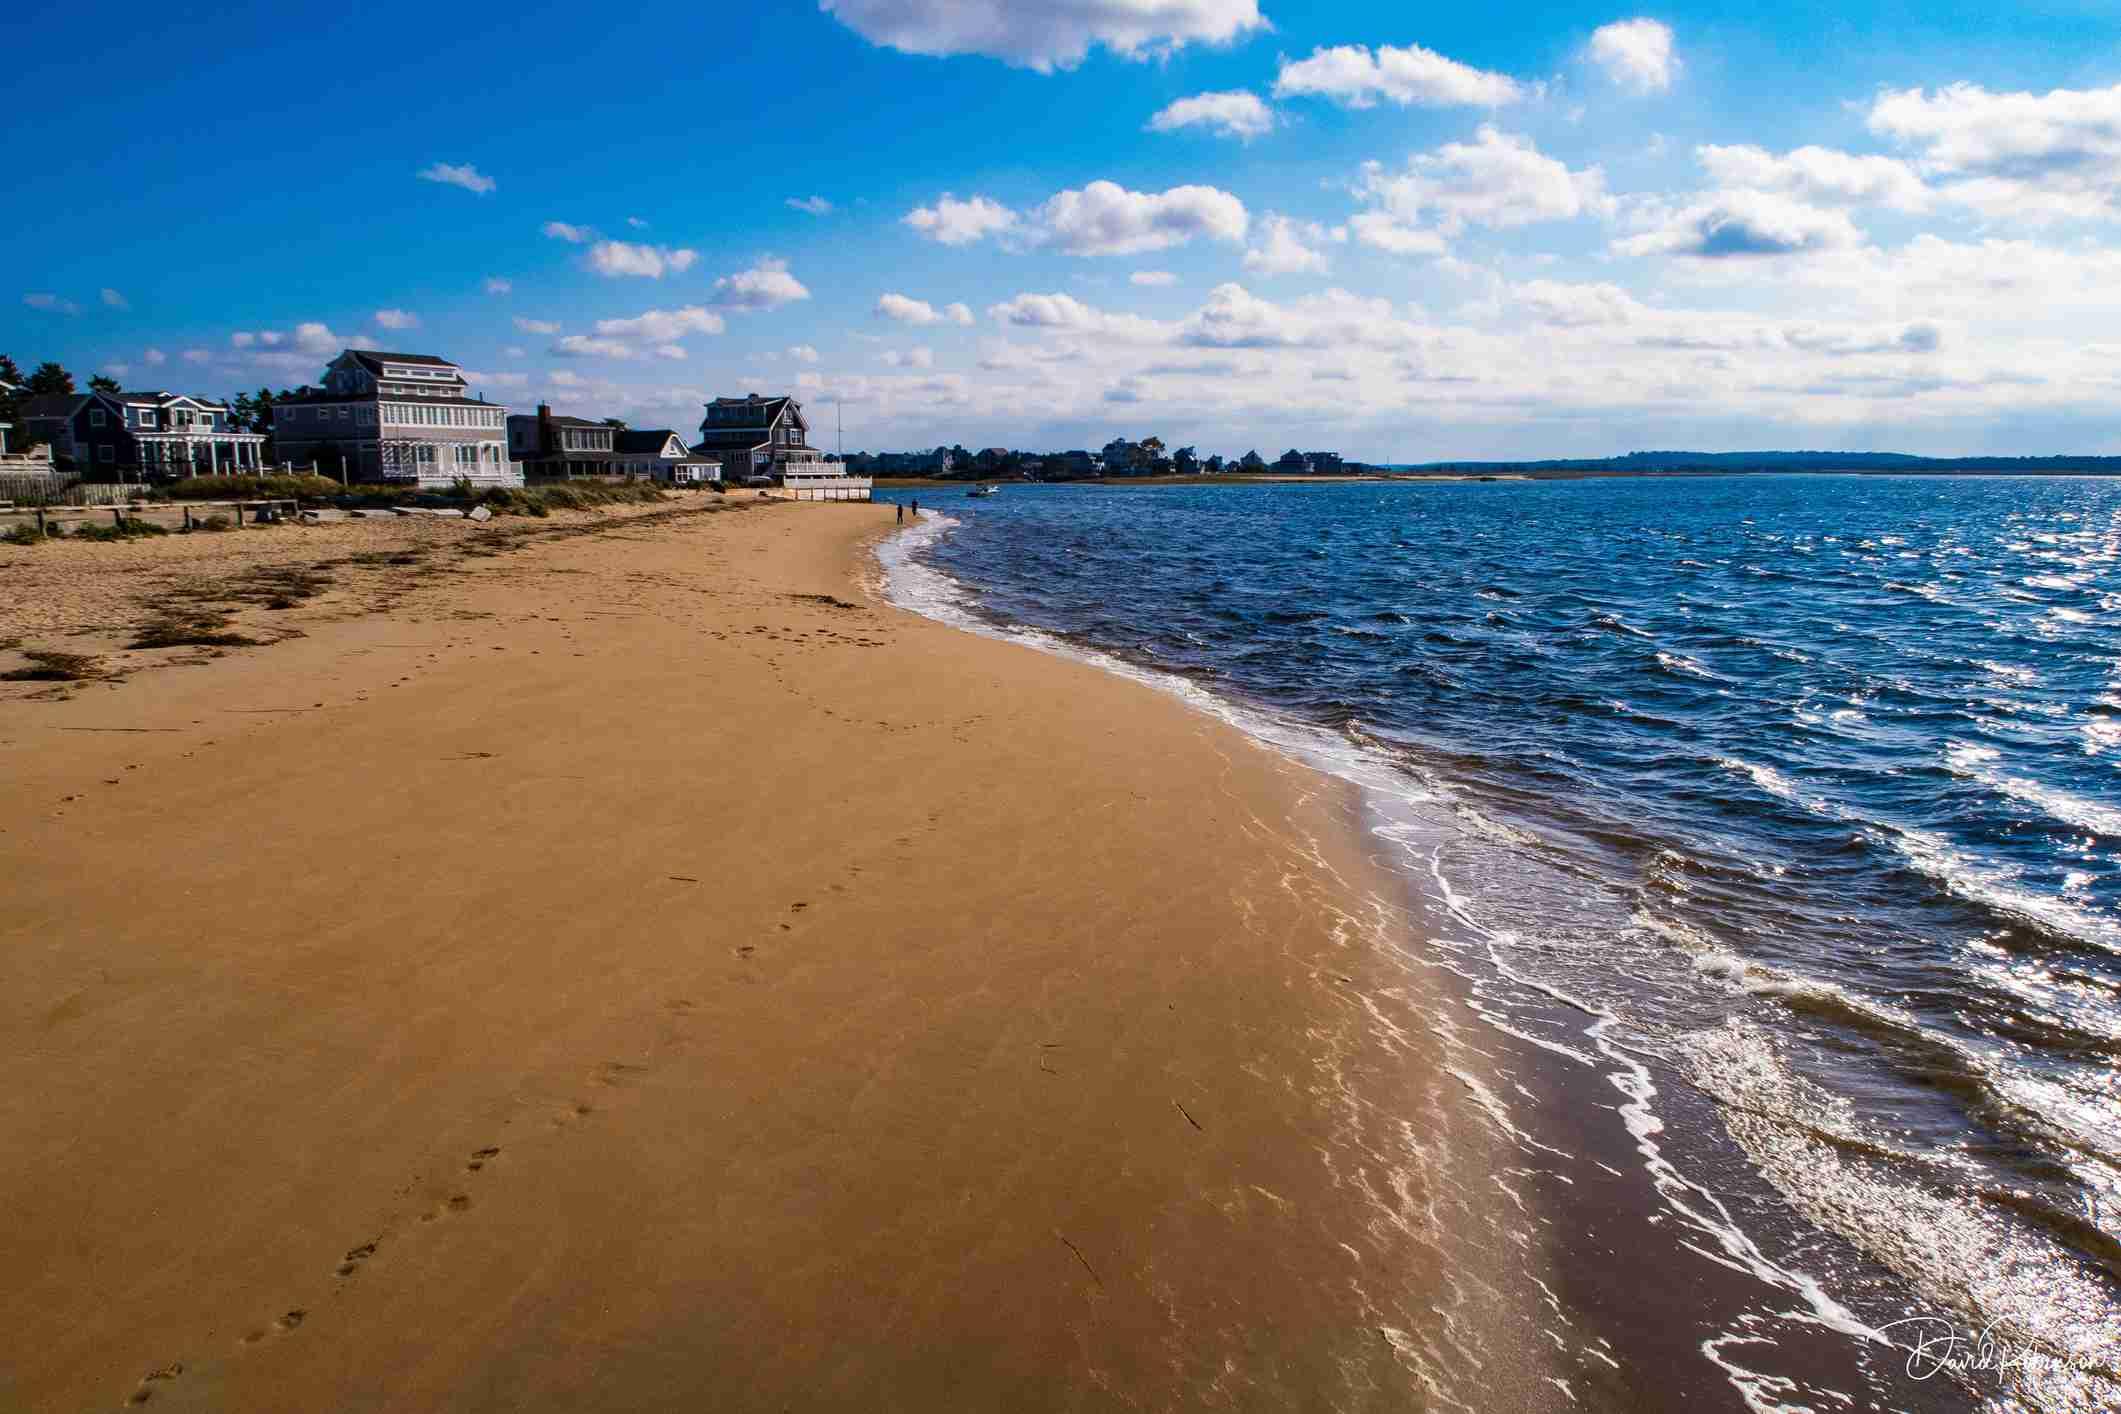 Plum Island Beach, near Boston, United States